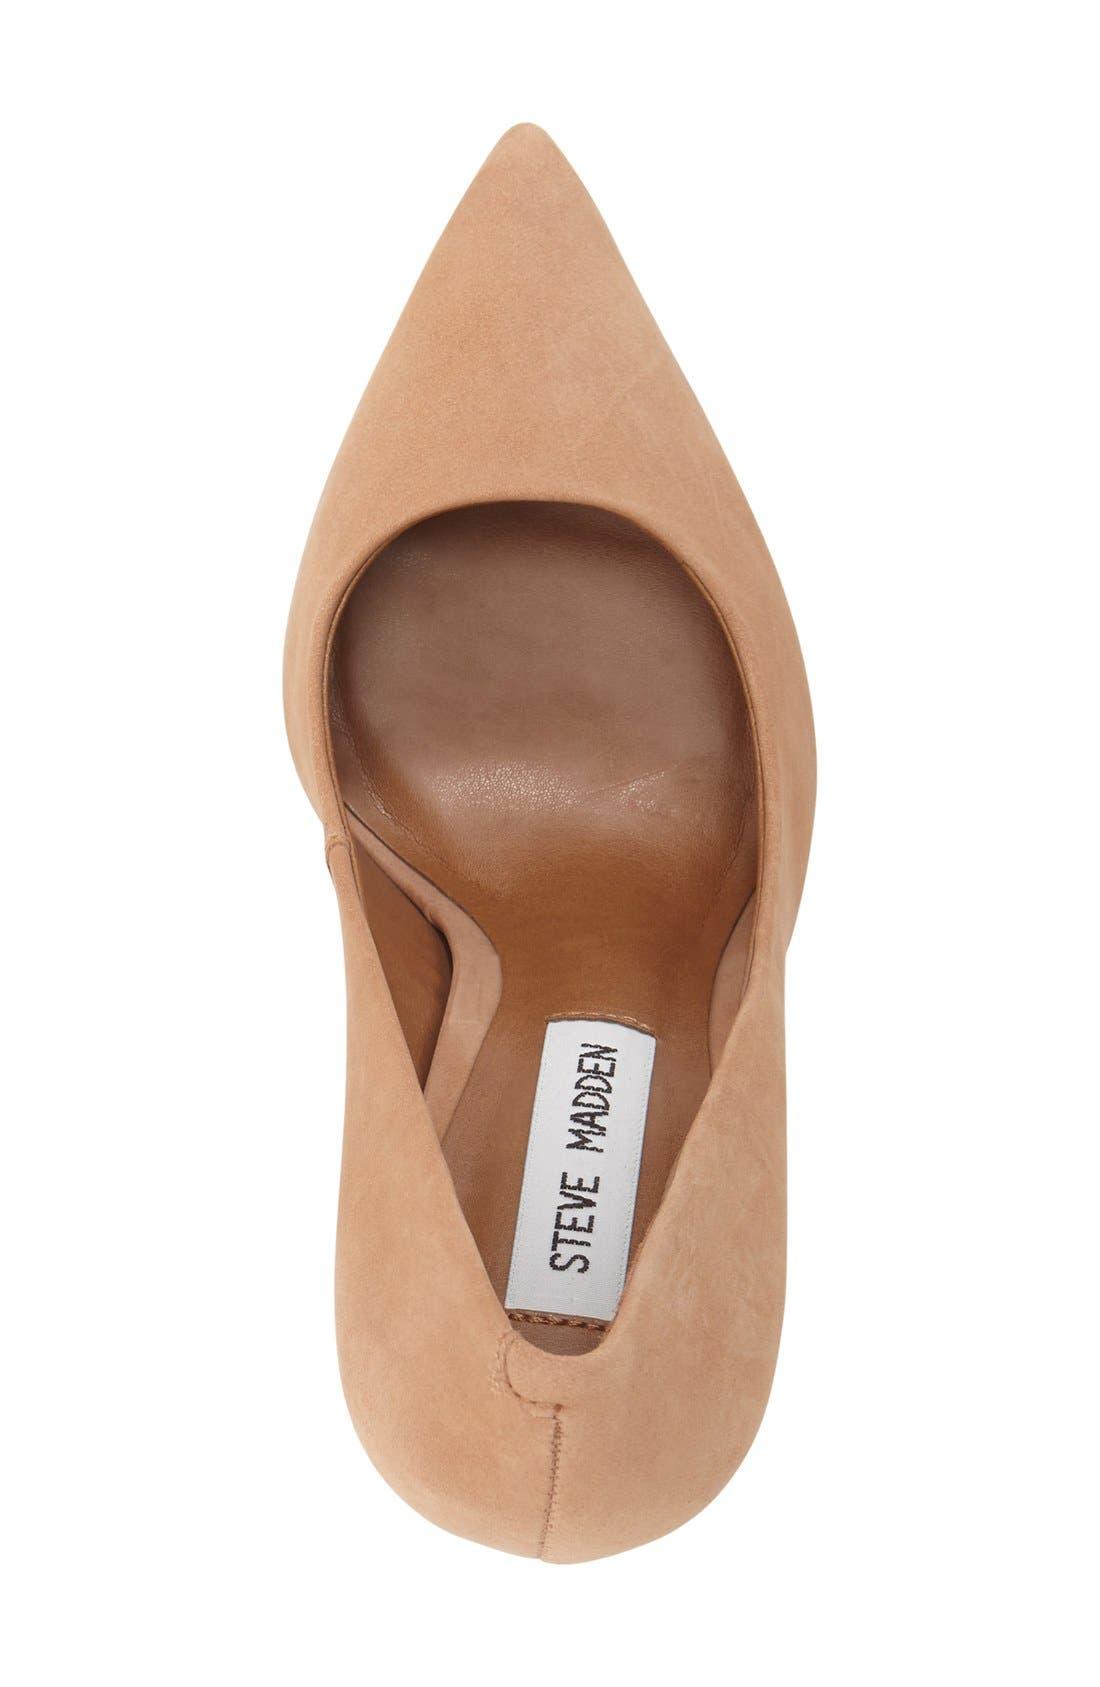 Alternate Image 3  - Steve Madden 'Primpy' Pointy Toe Block Heel Pump (Women)